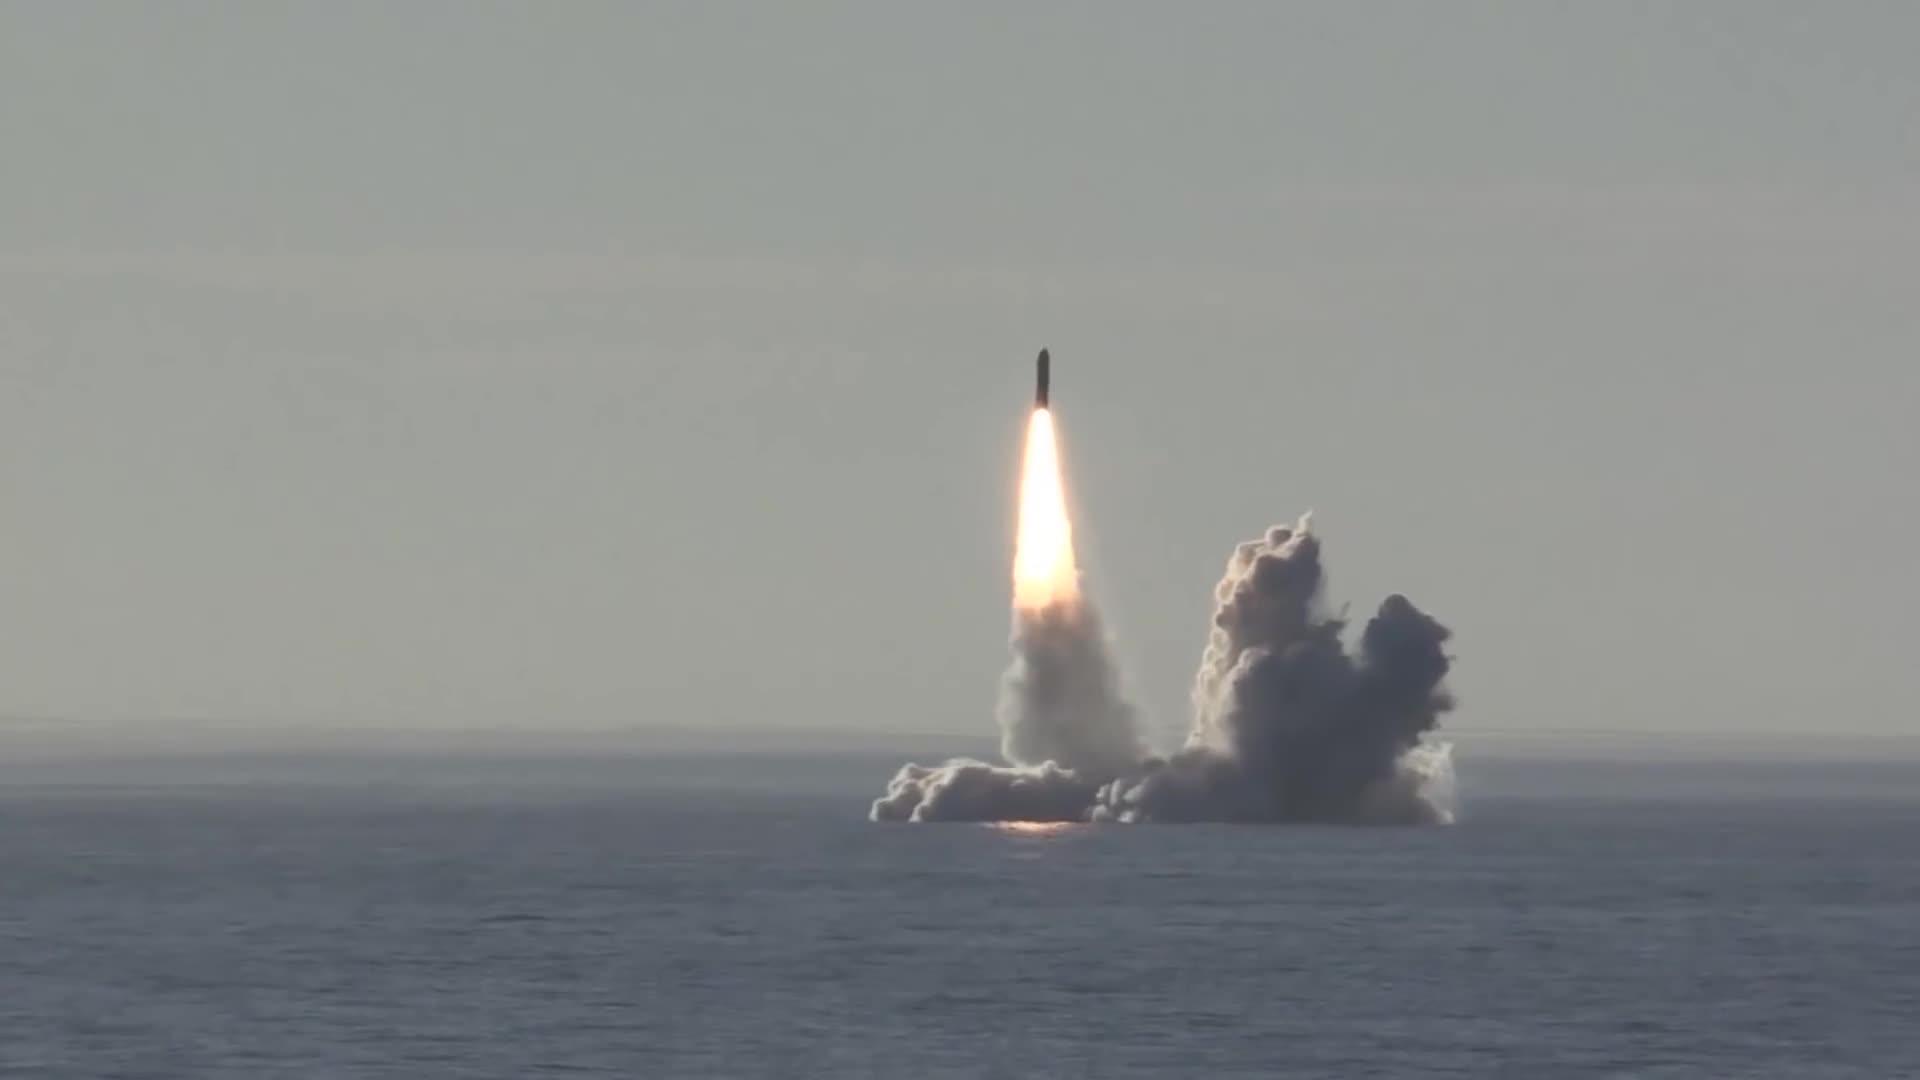 ICBM, submarine, Bulava ICBM launch GIFs